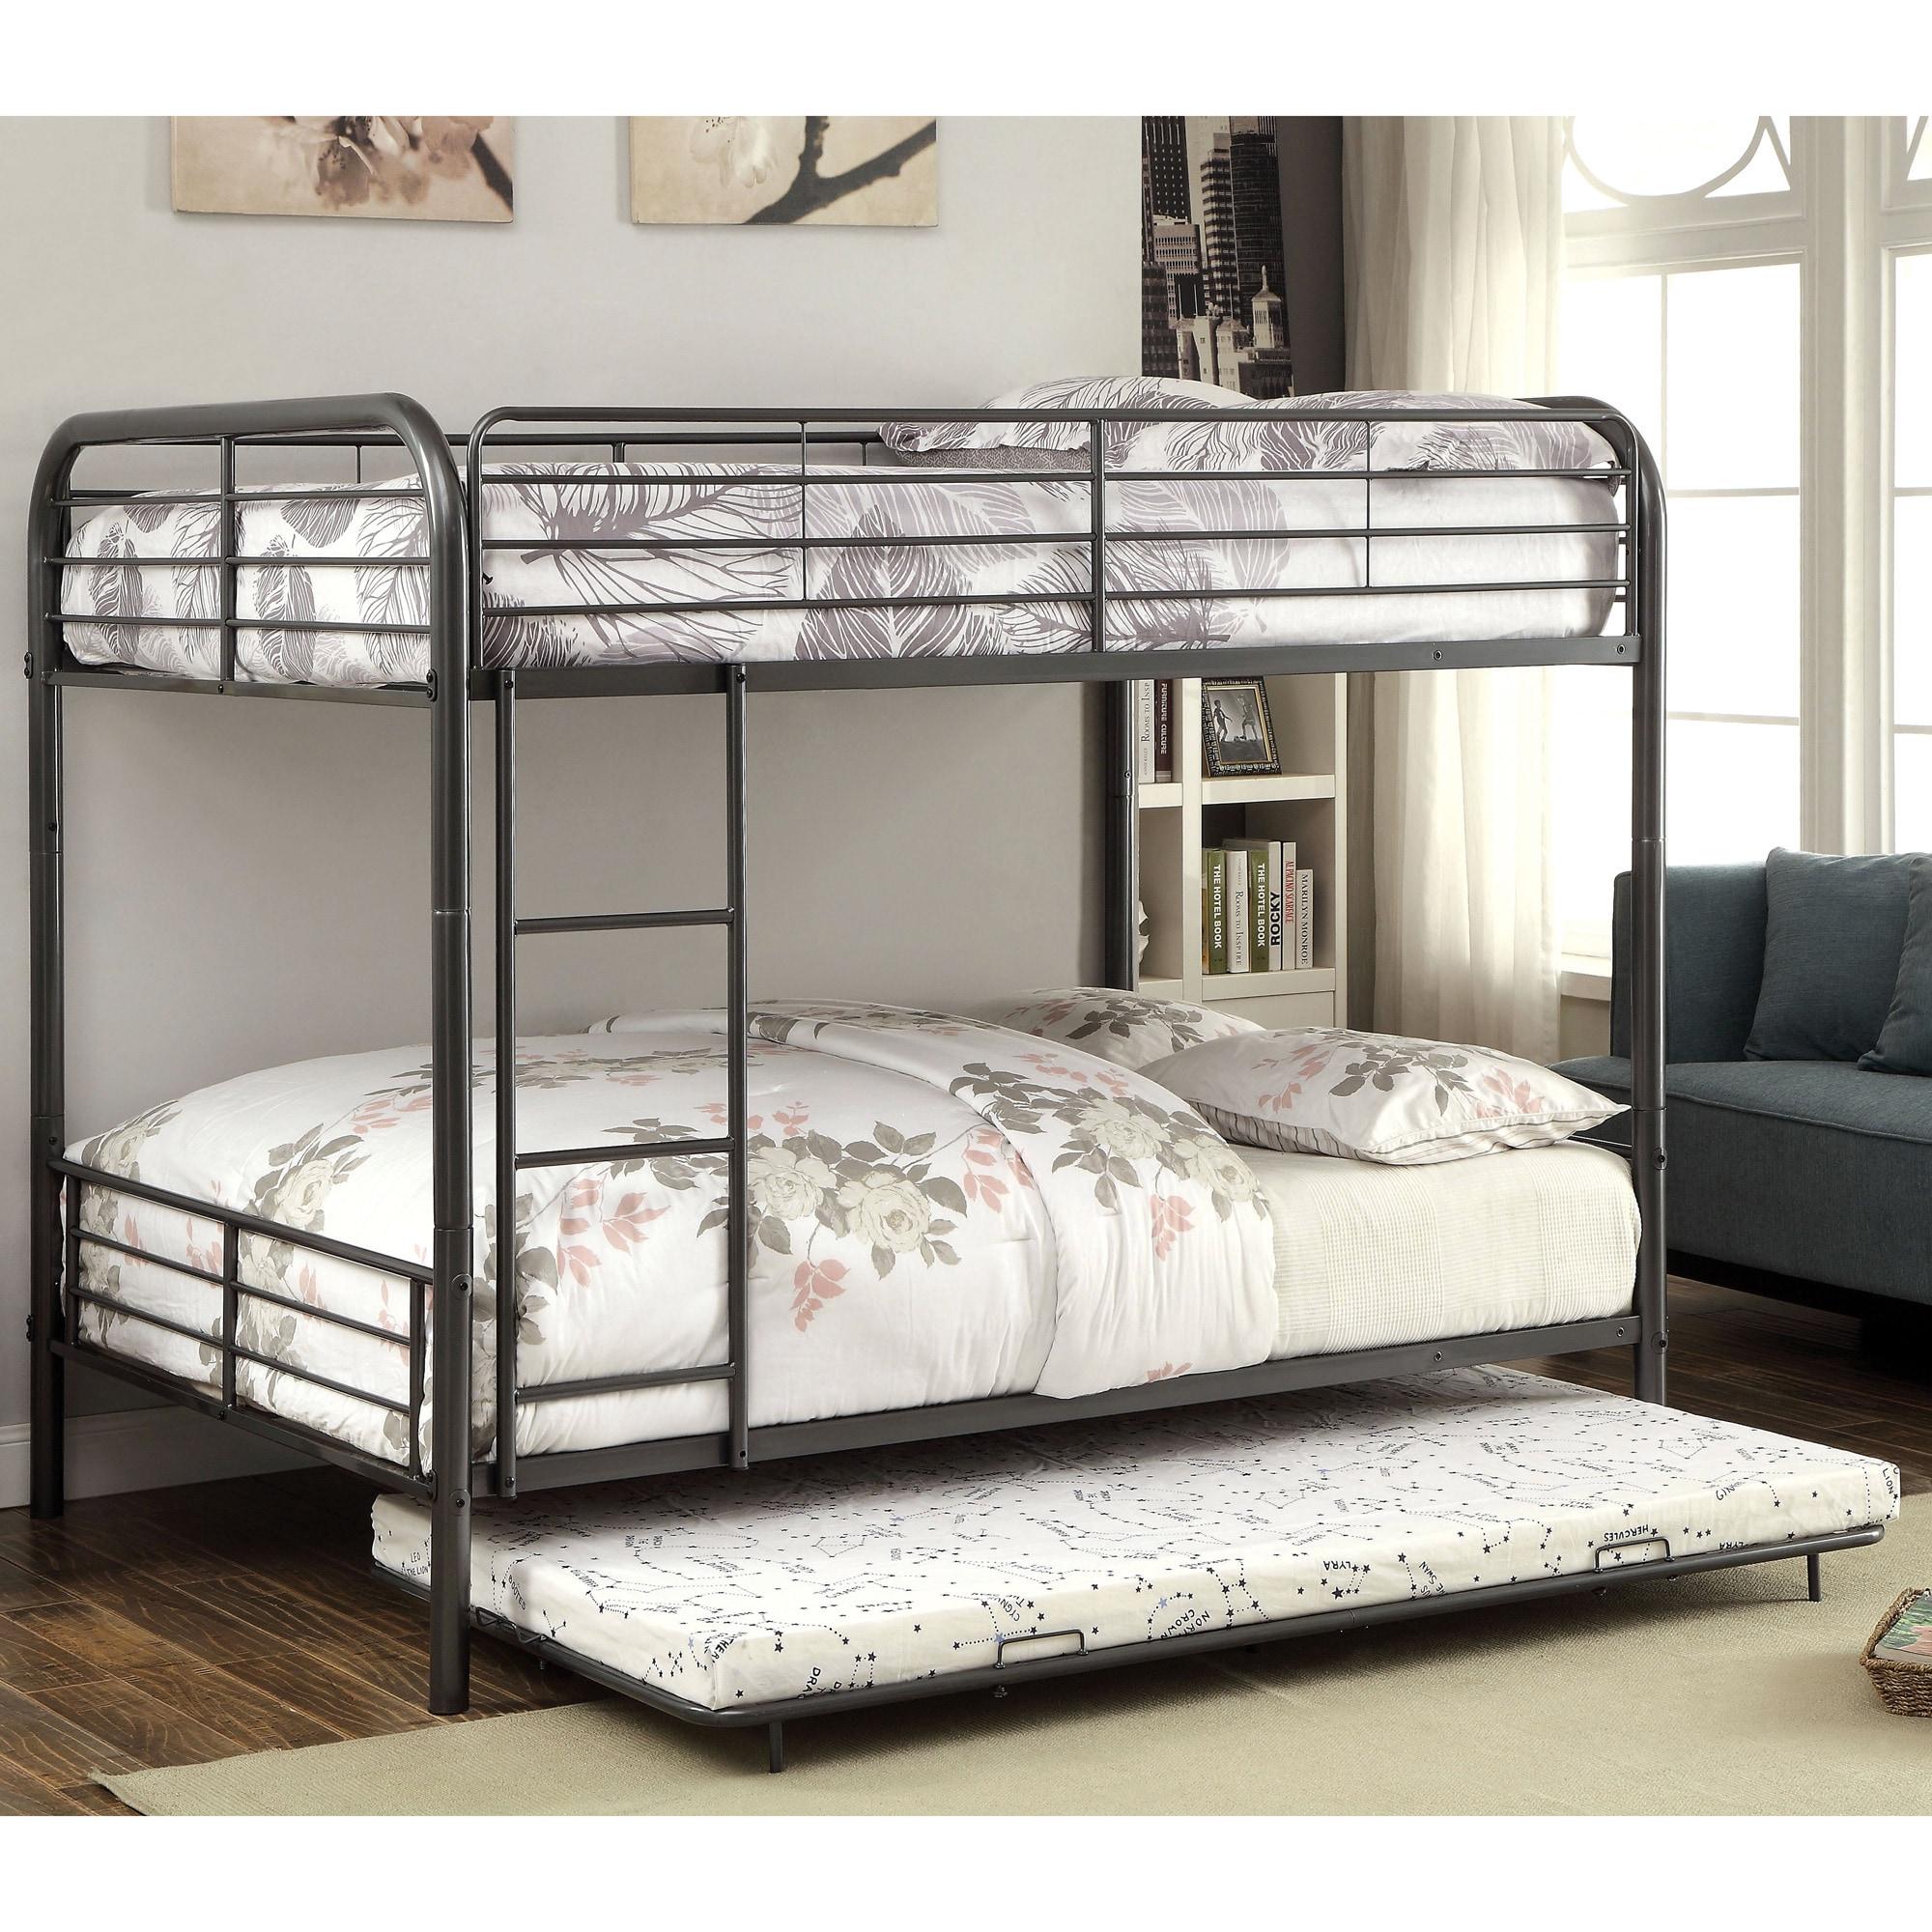 Furniture Of America Wila Modern Full